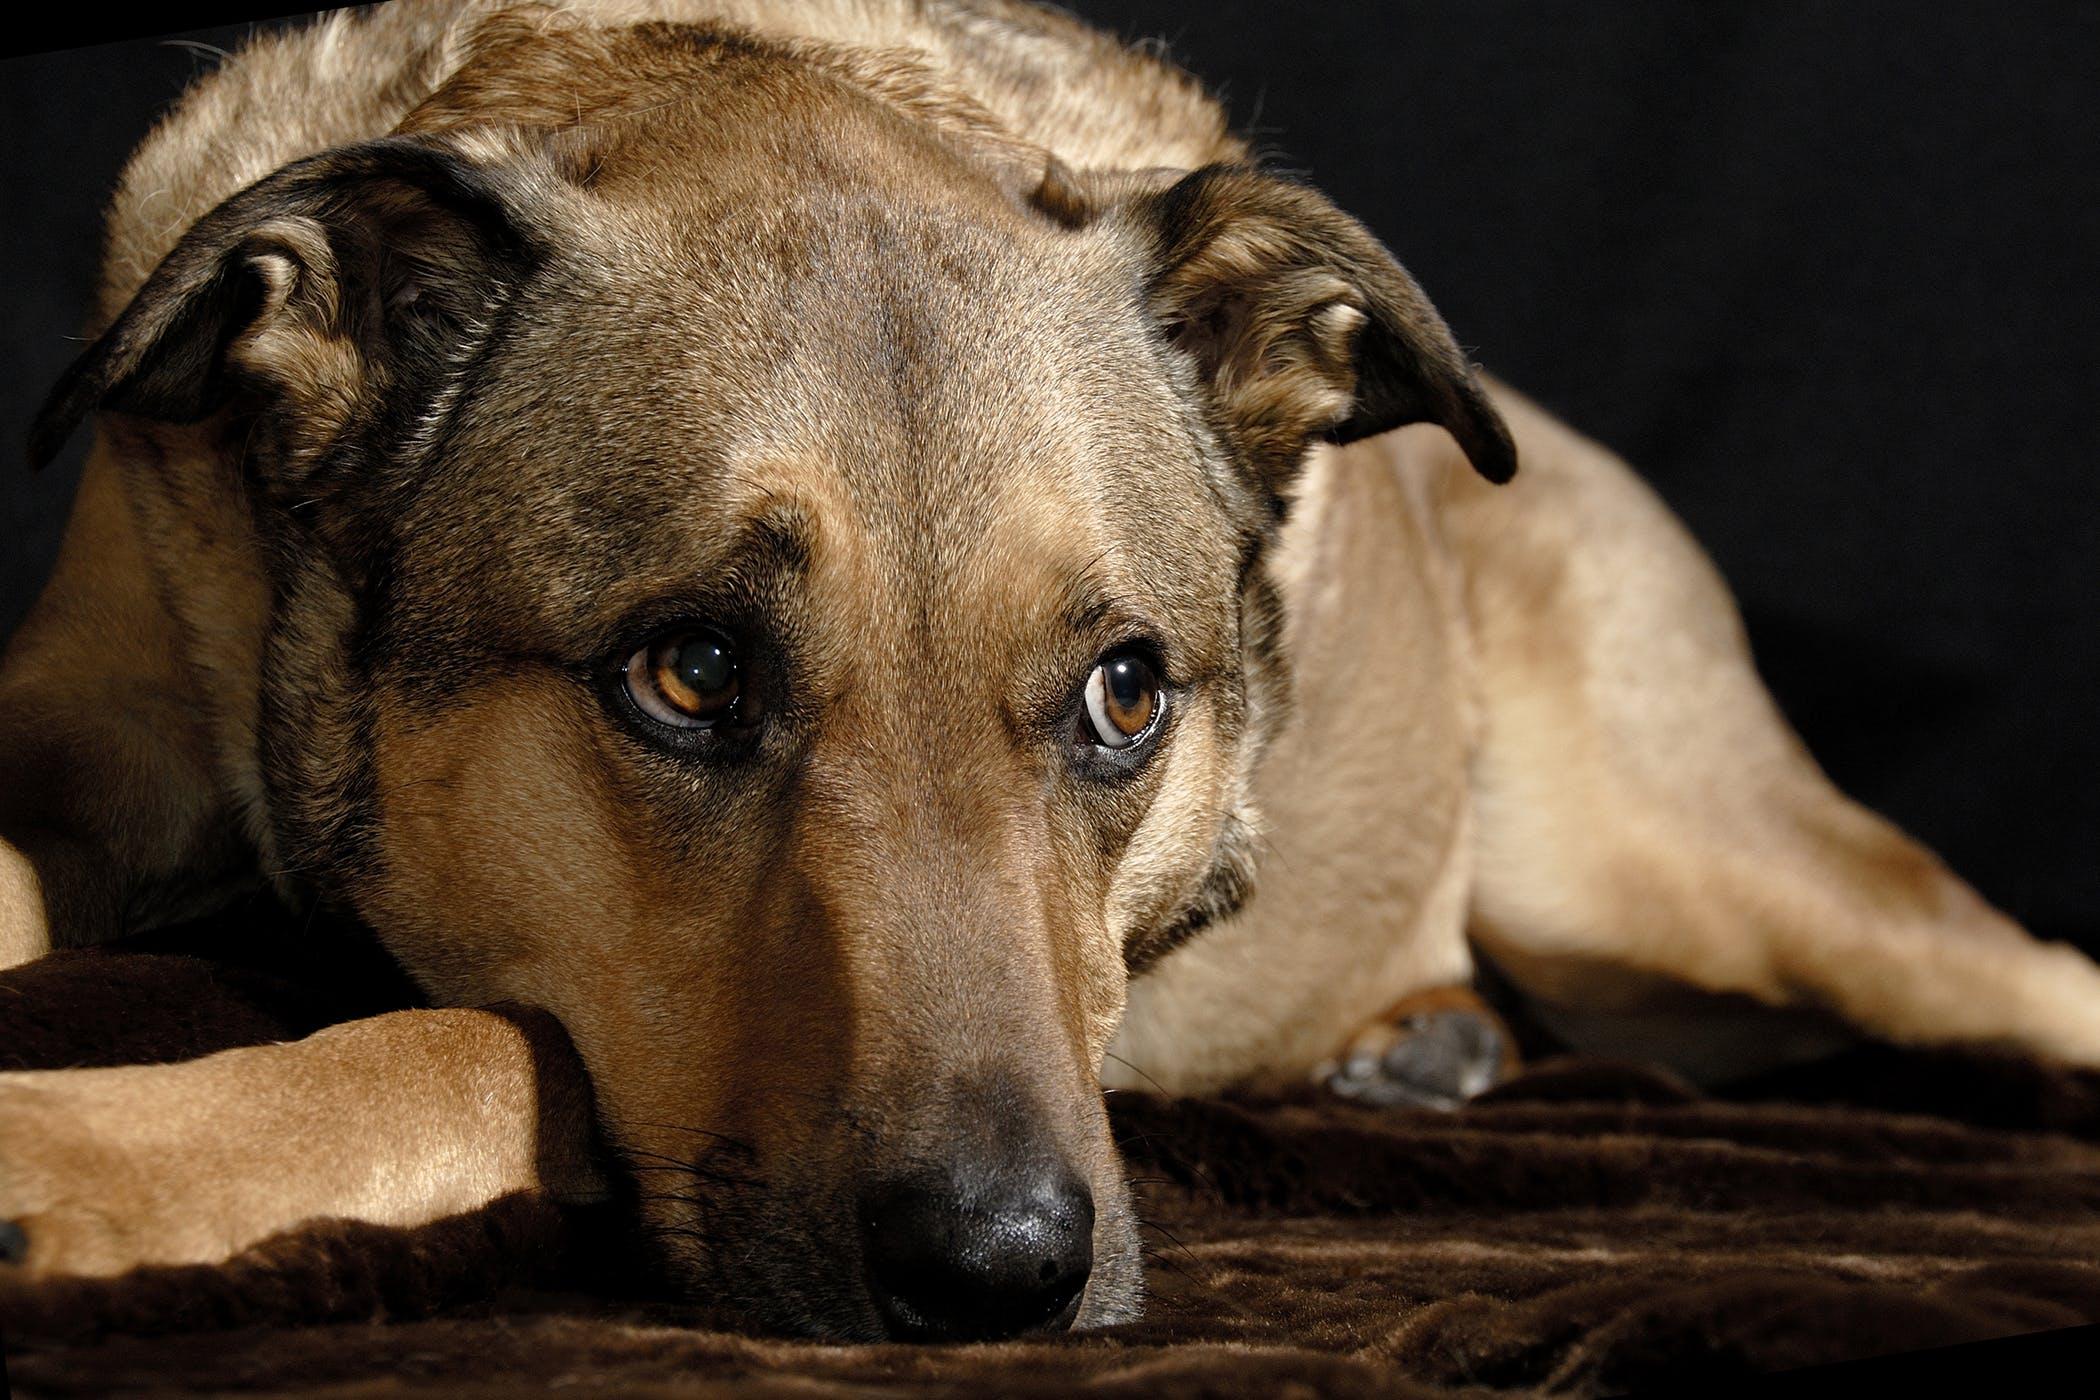 Pericardial Window in Dogs